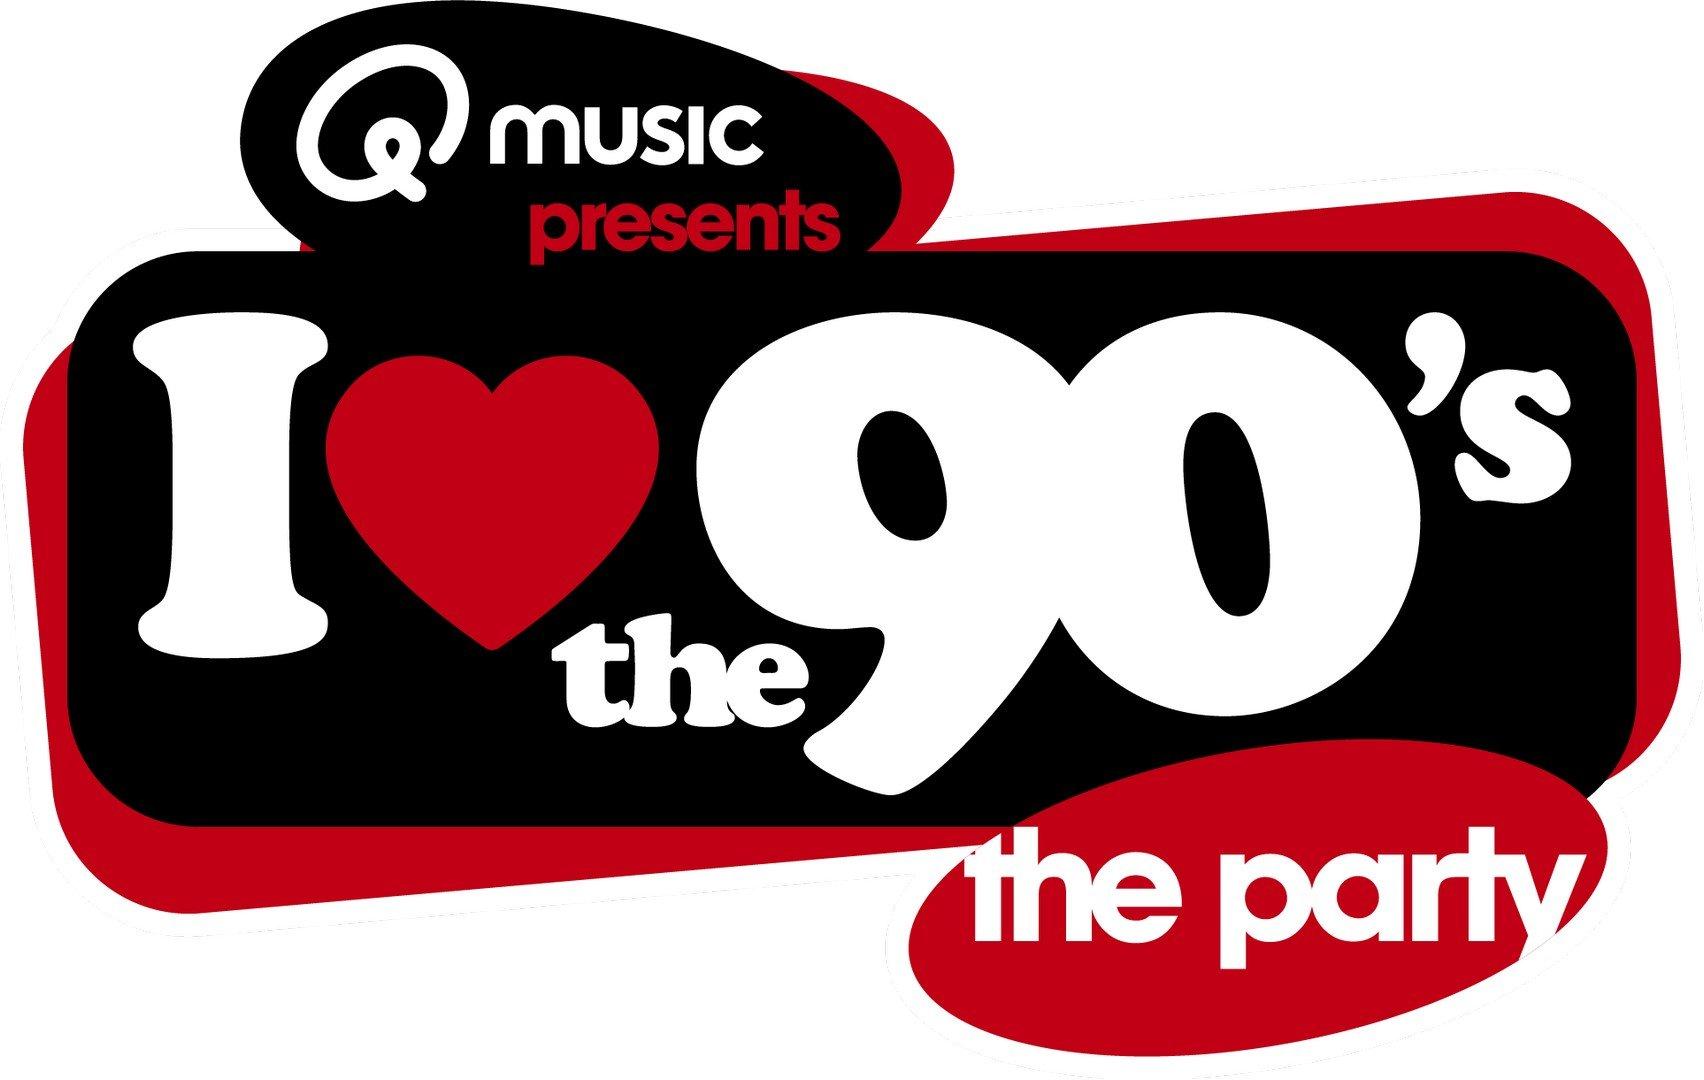 Culture Beat, 2 Brothers on the 4th Floor en DJ Ward staan op 21 maart op I love the 90's - I Love The 90s 2020